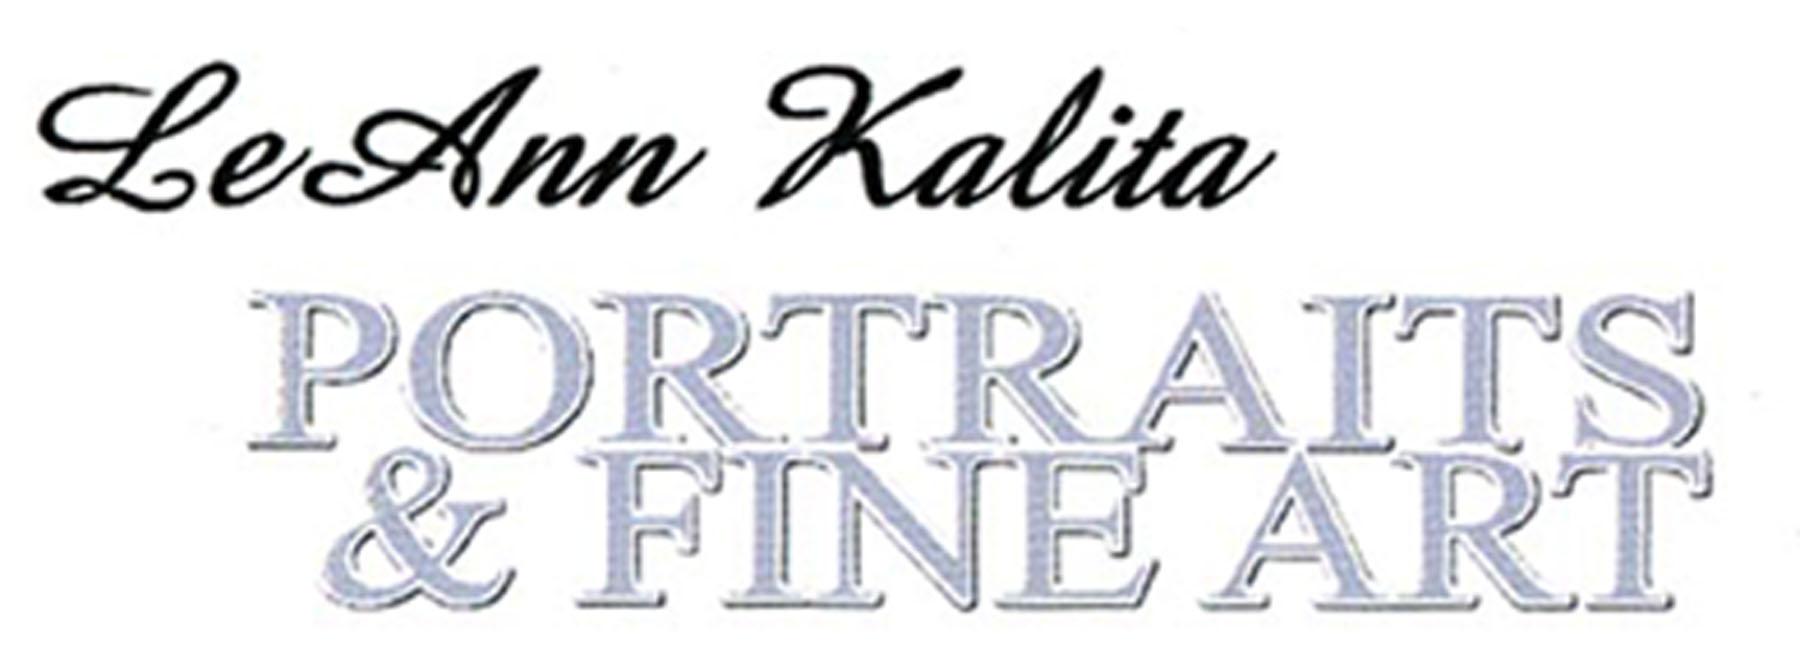 LeAnn Kalita - Portraits and Fine Art